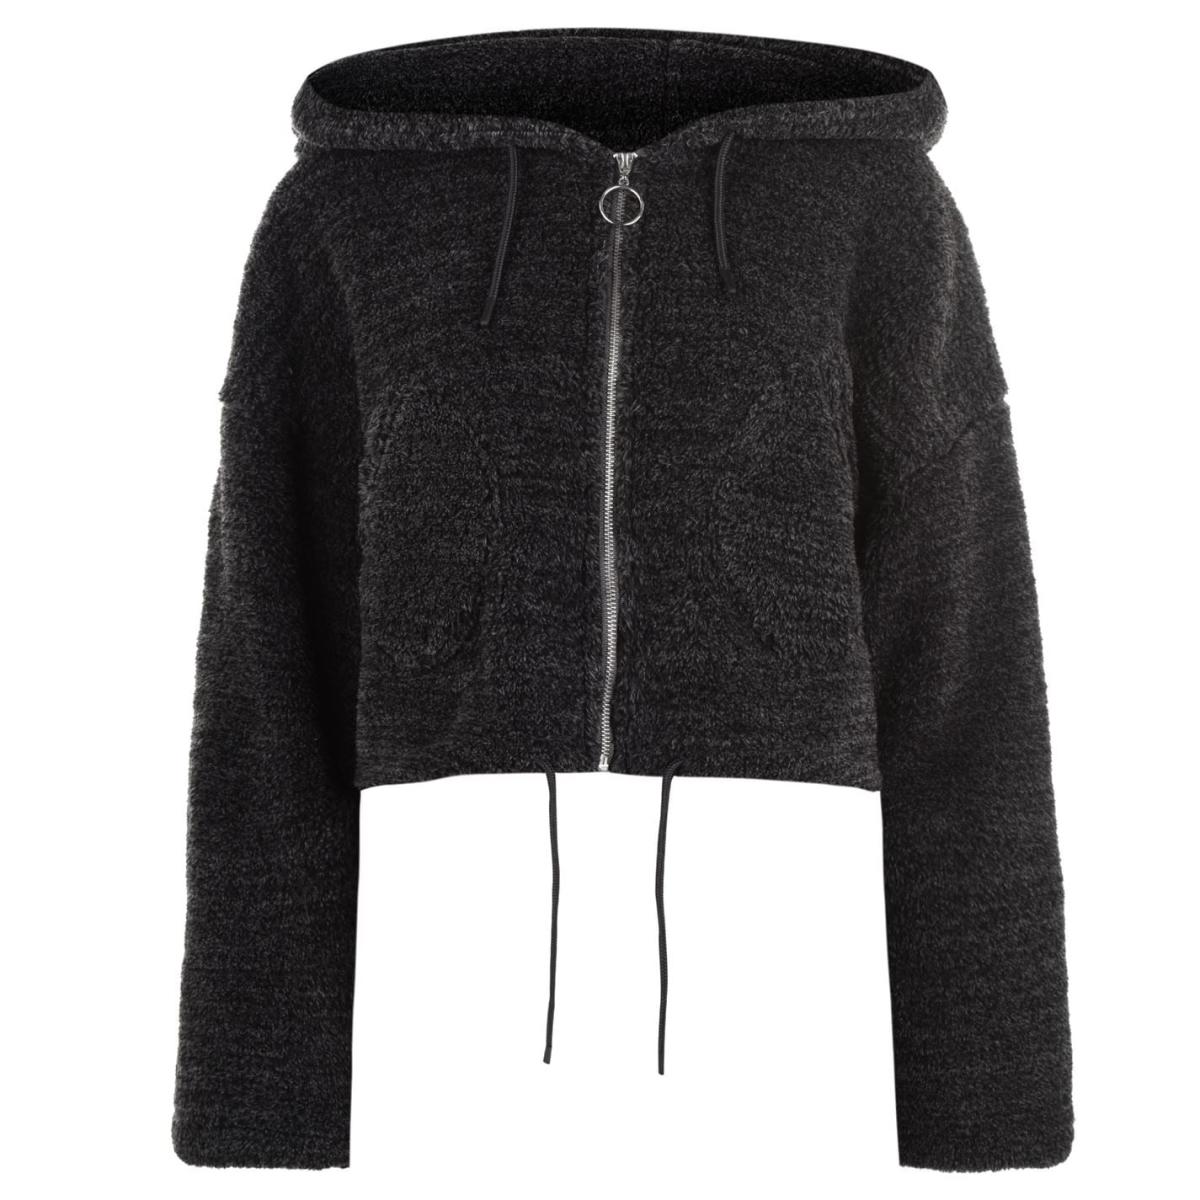 Golddigga Kapuzenpullover Sweatshirt Pullover Damen Kapuzenjacke Jacke 5164